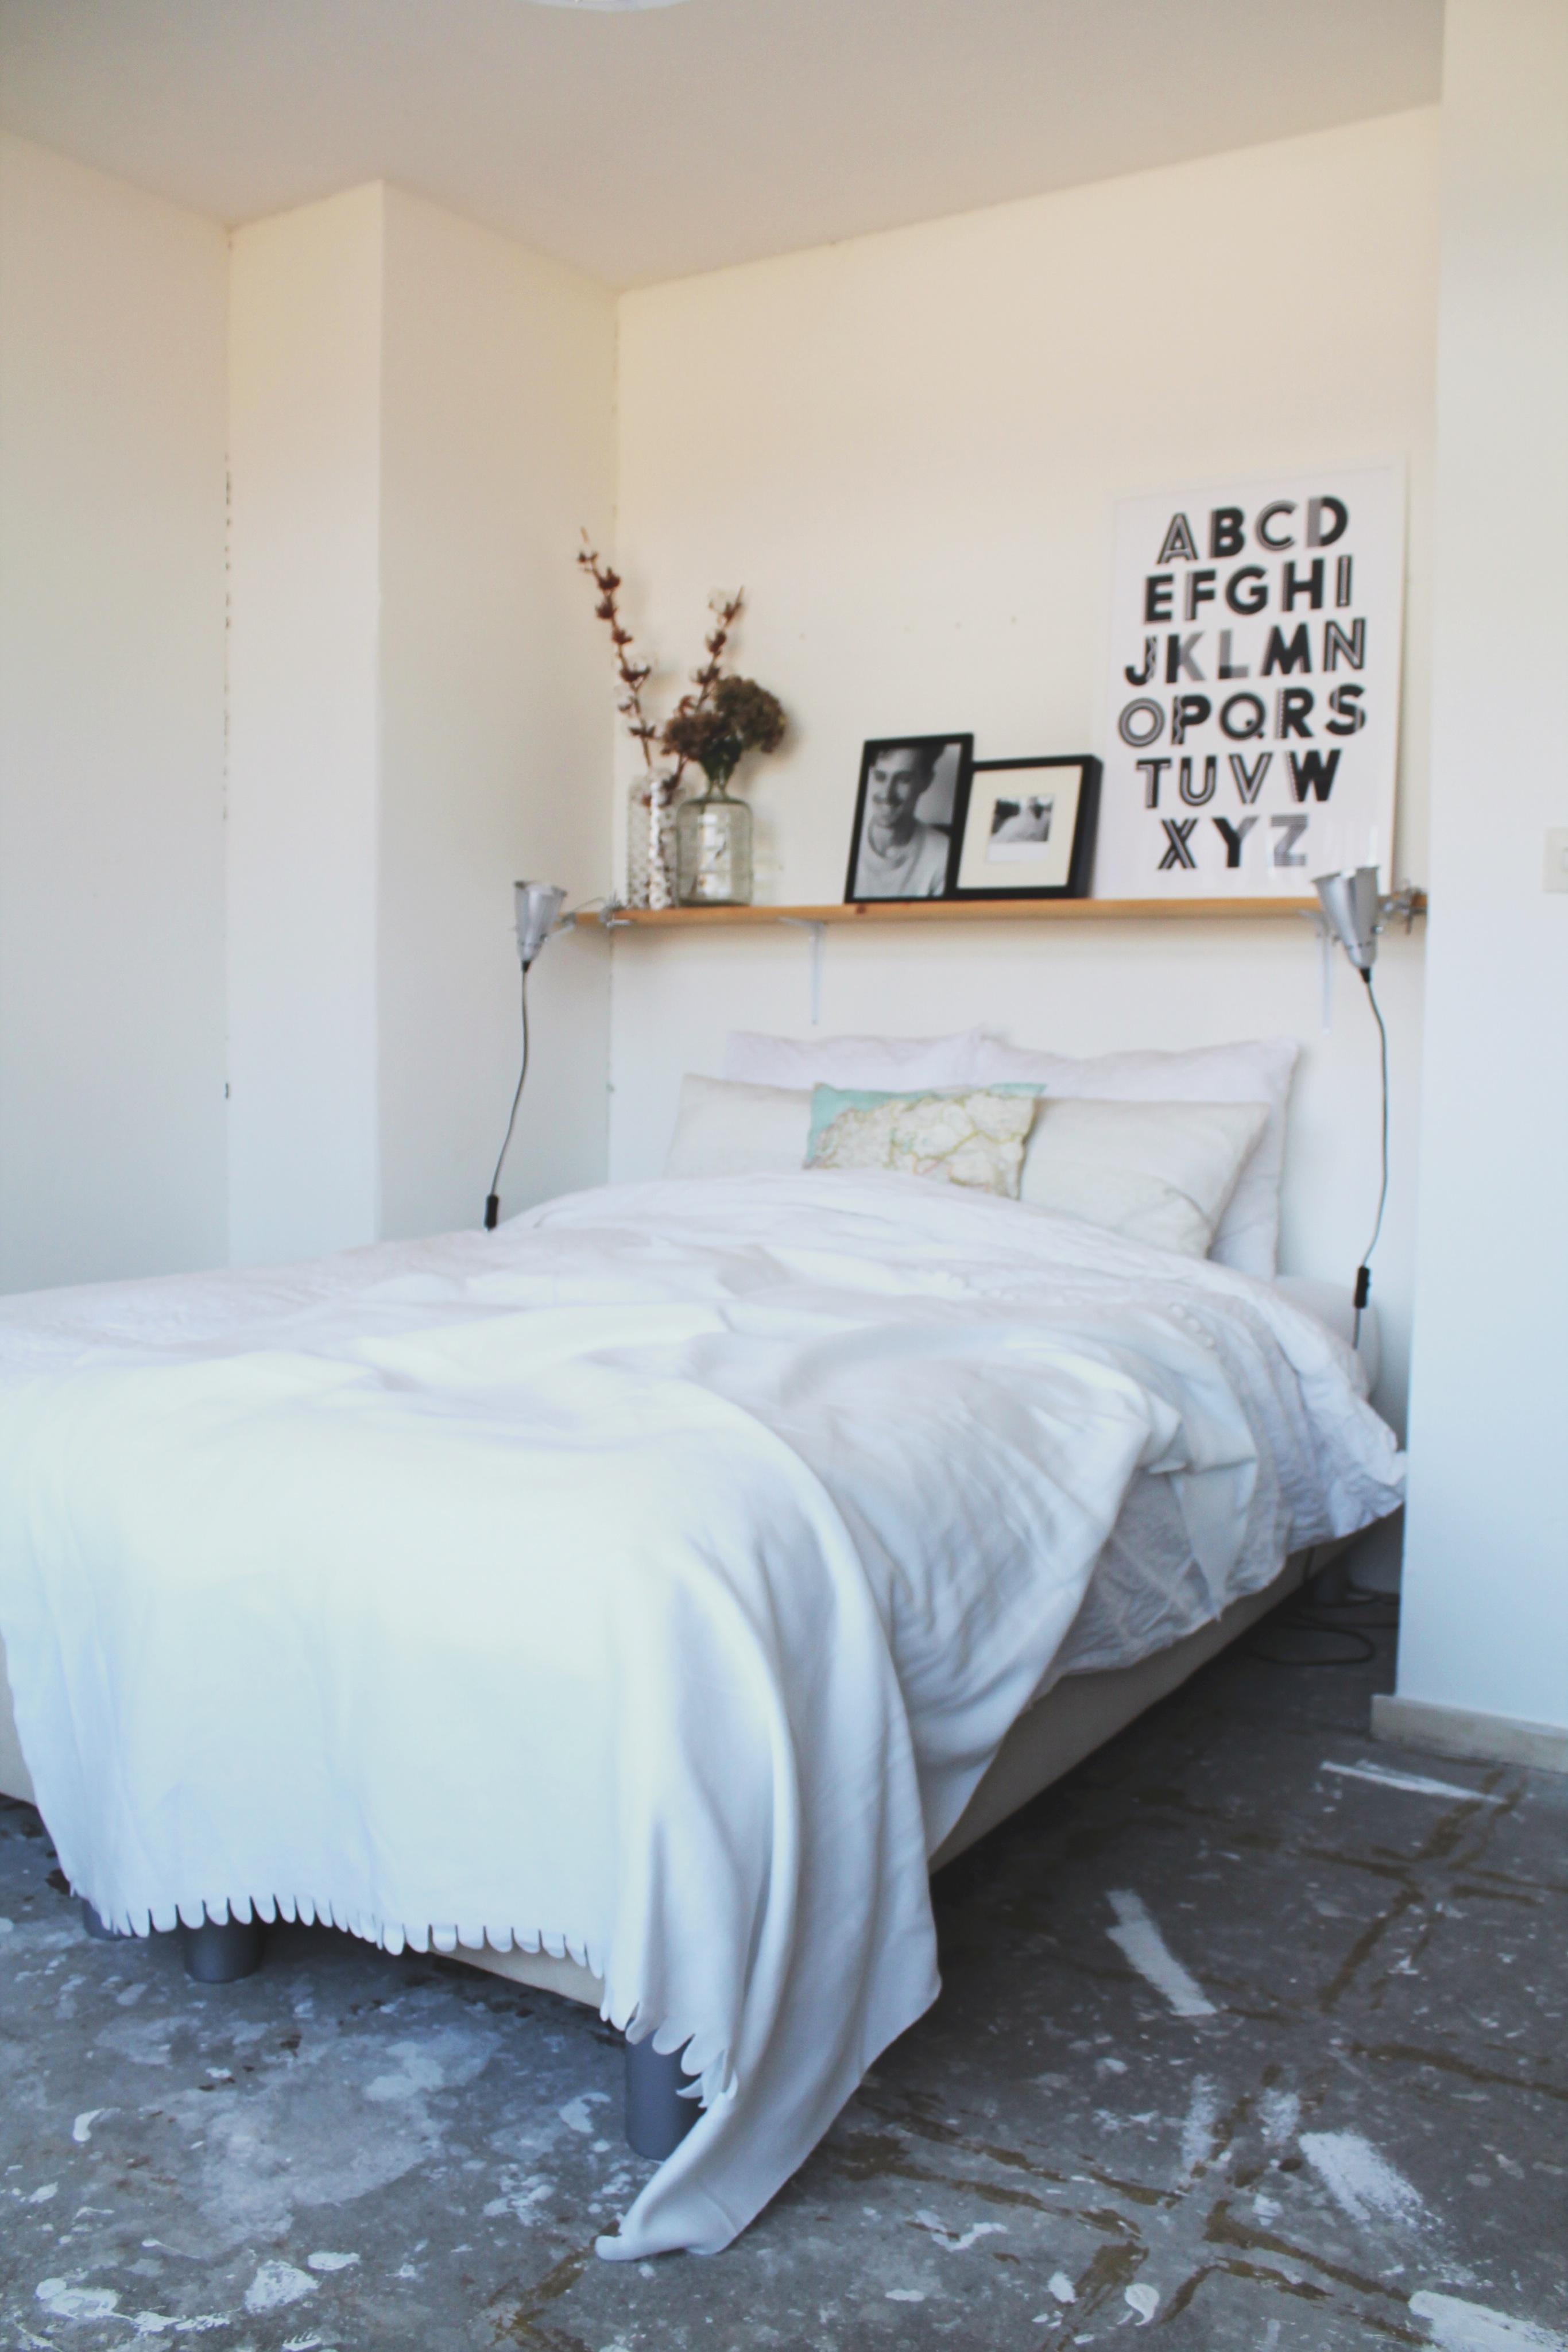 Nieuwe slaapkamer - donebymyself